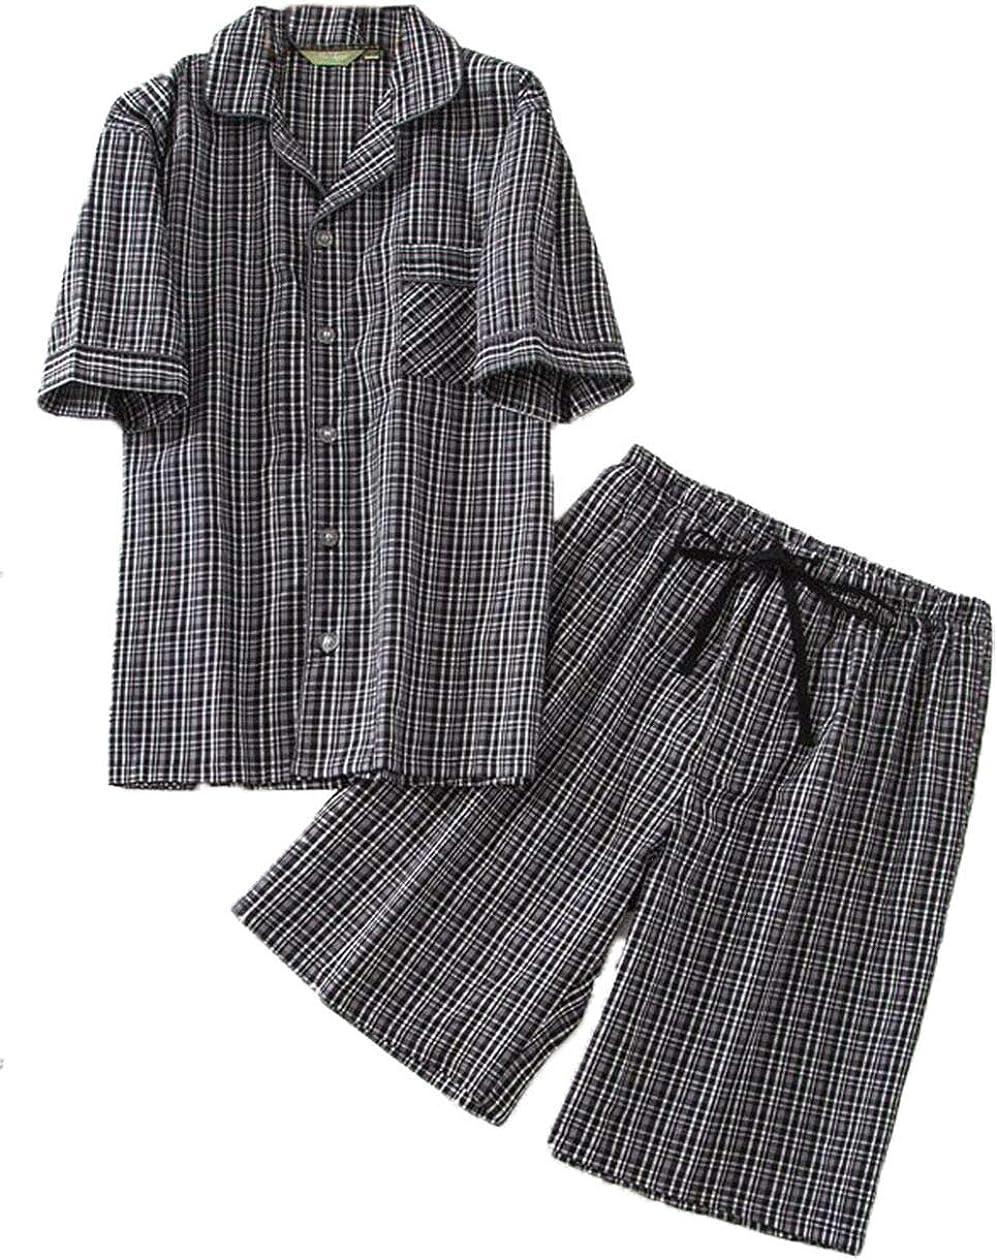 PNAEONG Men's Cotton Woven Short Sleeve Pajama Set Short Sleepwear